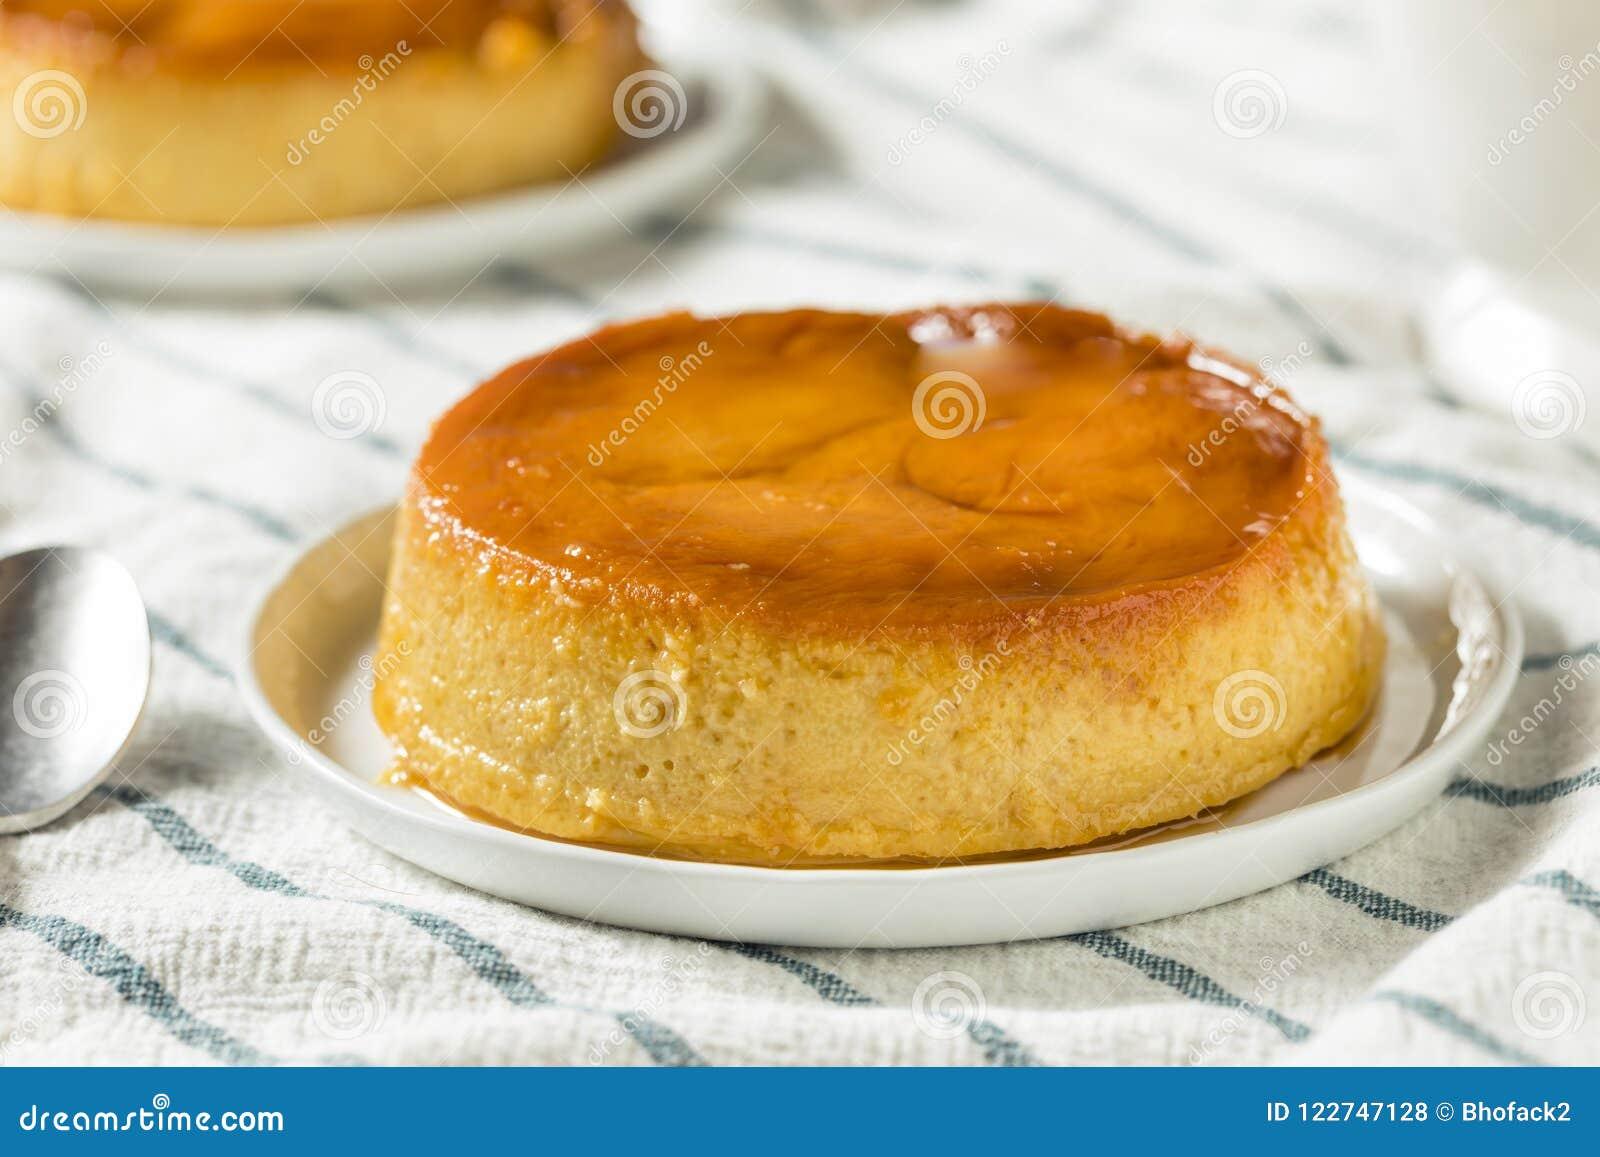 Sweet Homemade Spanish Flan Dessert